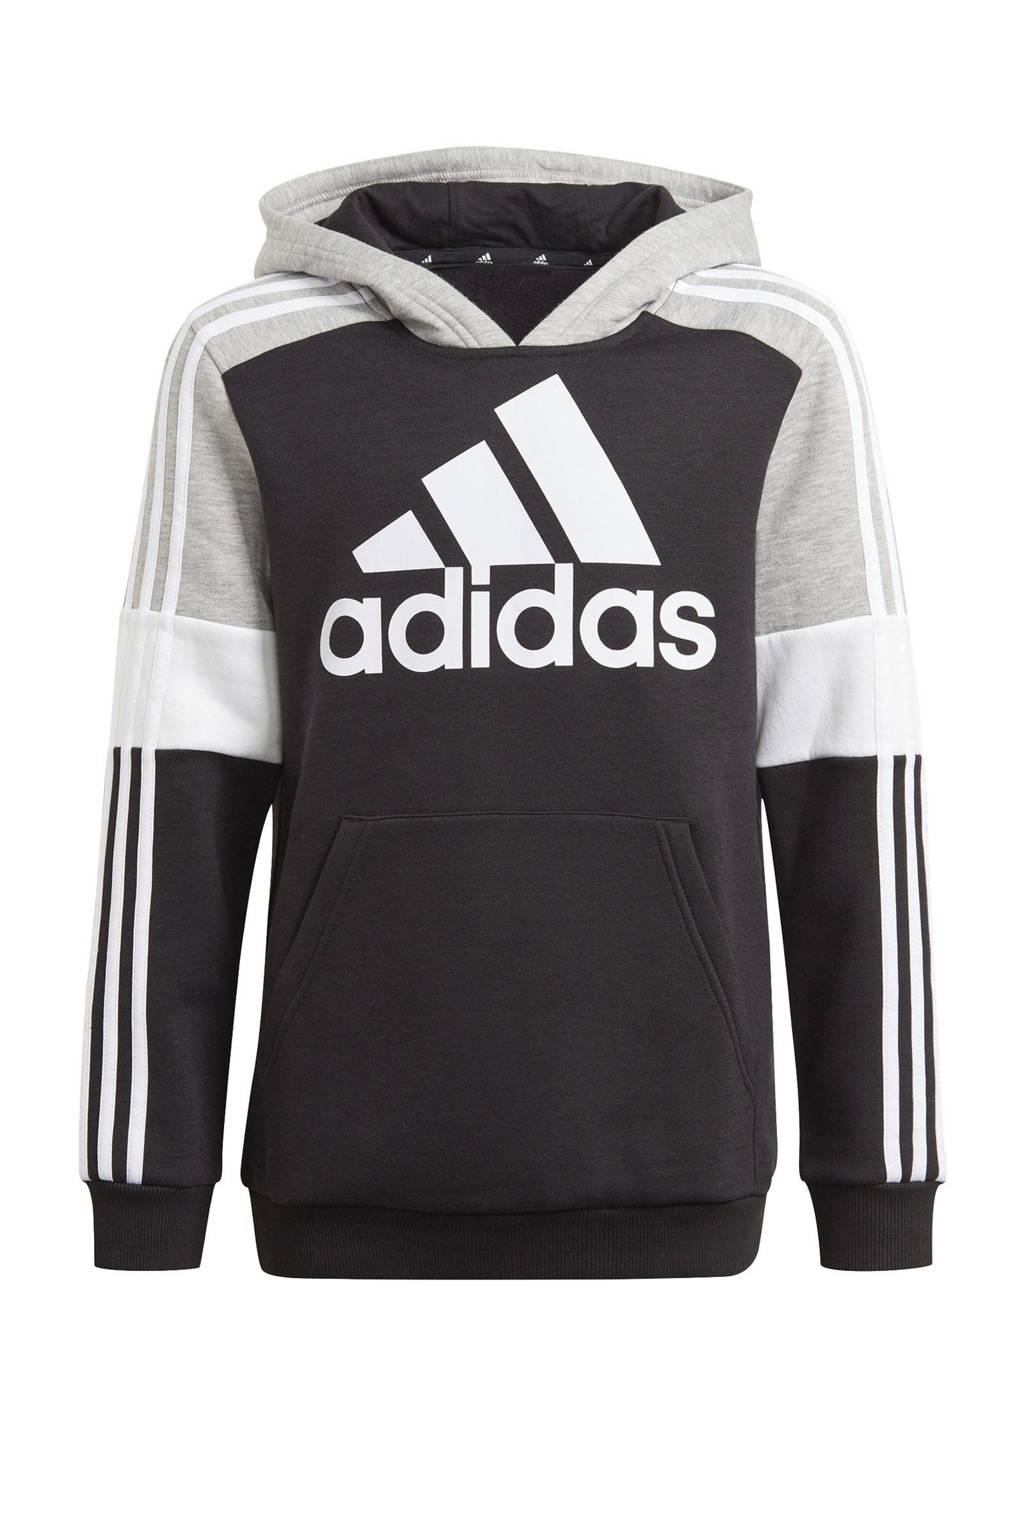 adidas Performance   fleece sporthoodie zwart/grijs melange/wit, Zwart/grijs melange/wit